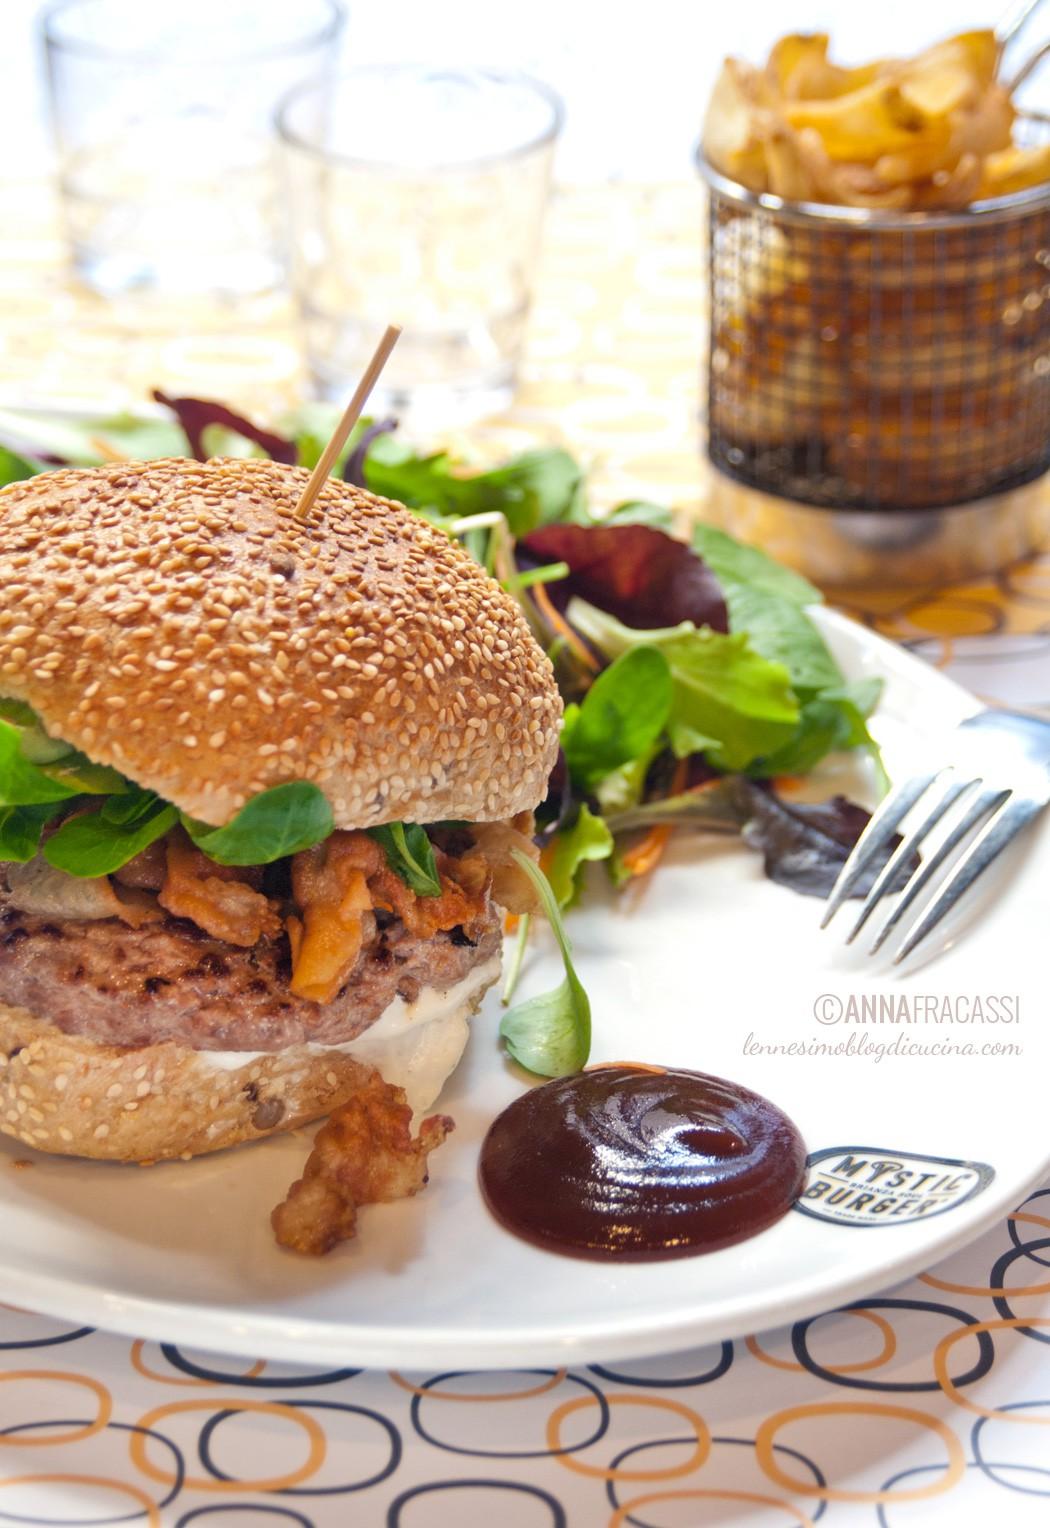 mystic burger montorfano ul dionigi